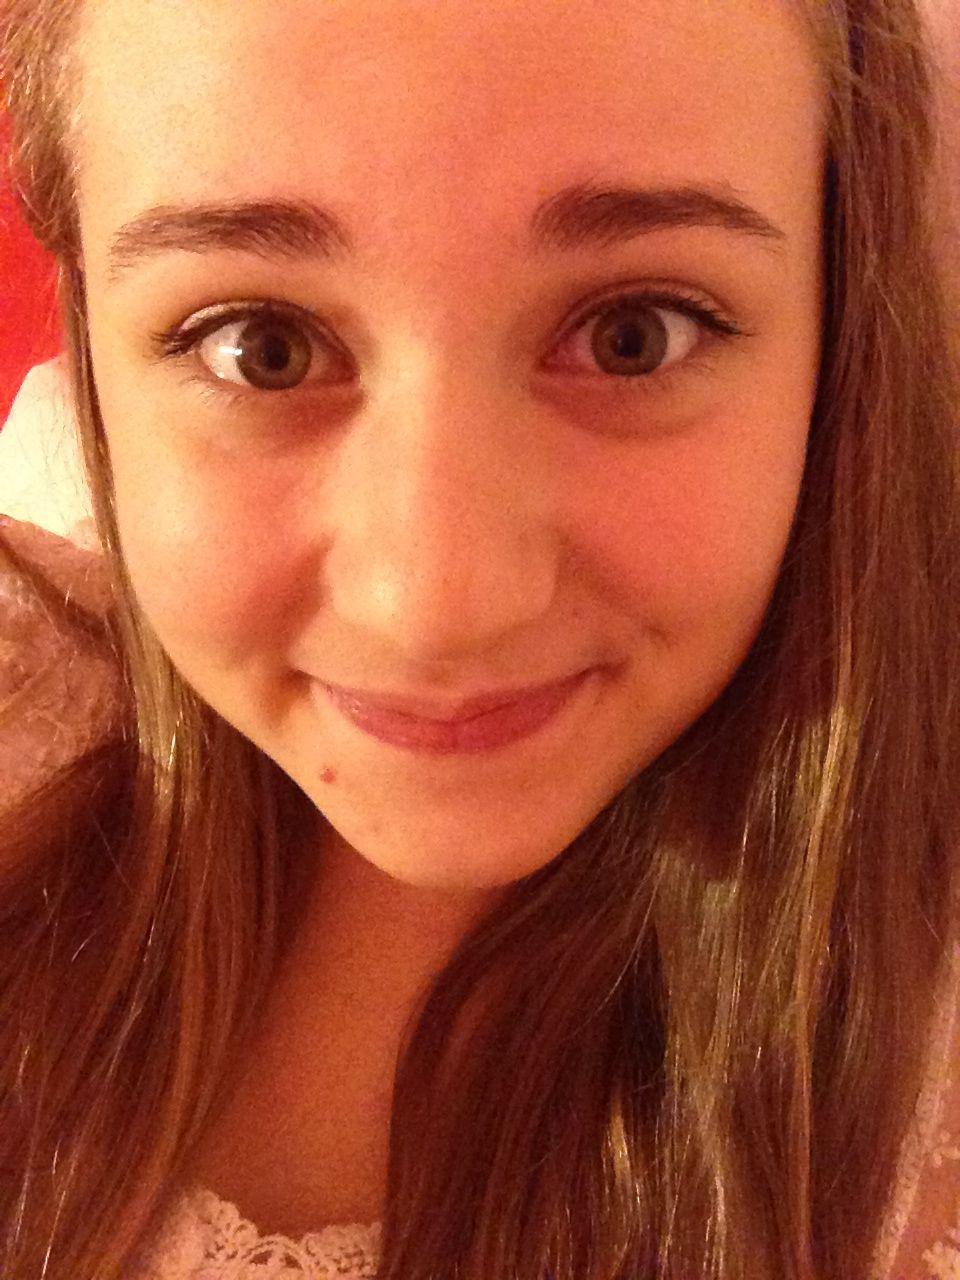 Yolo teen selfies